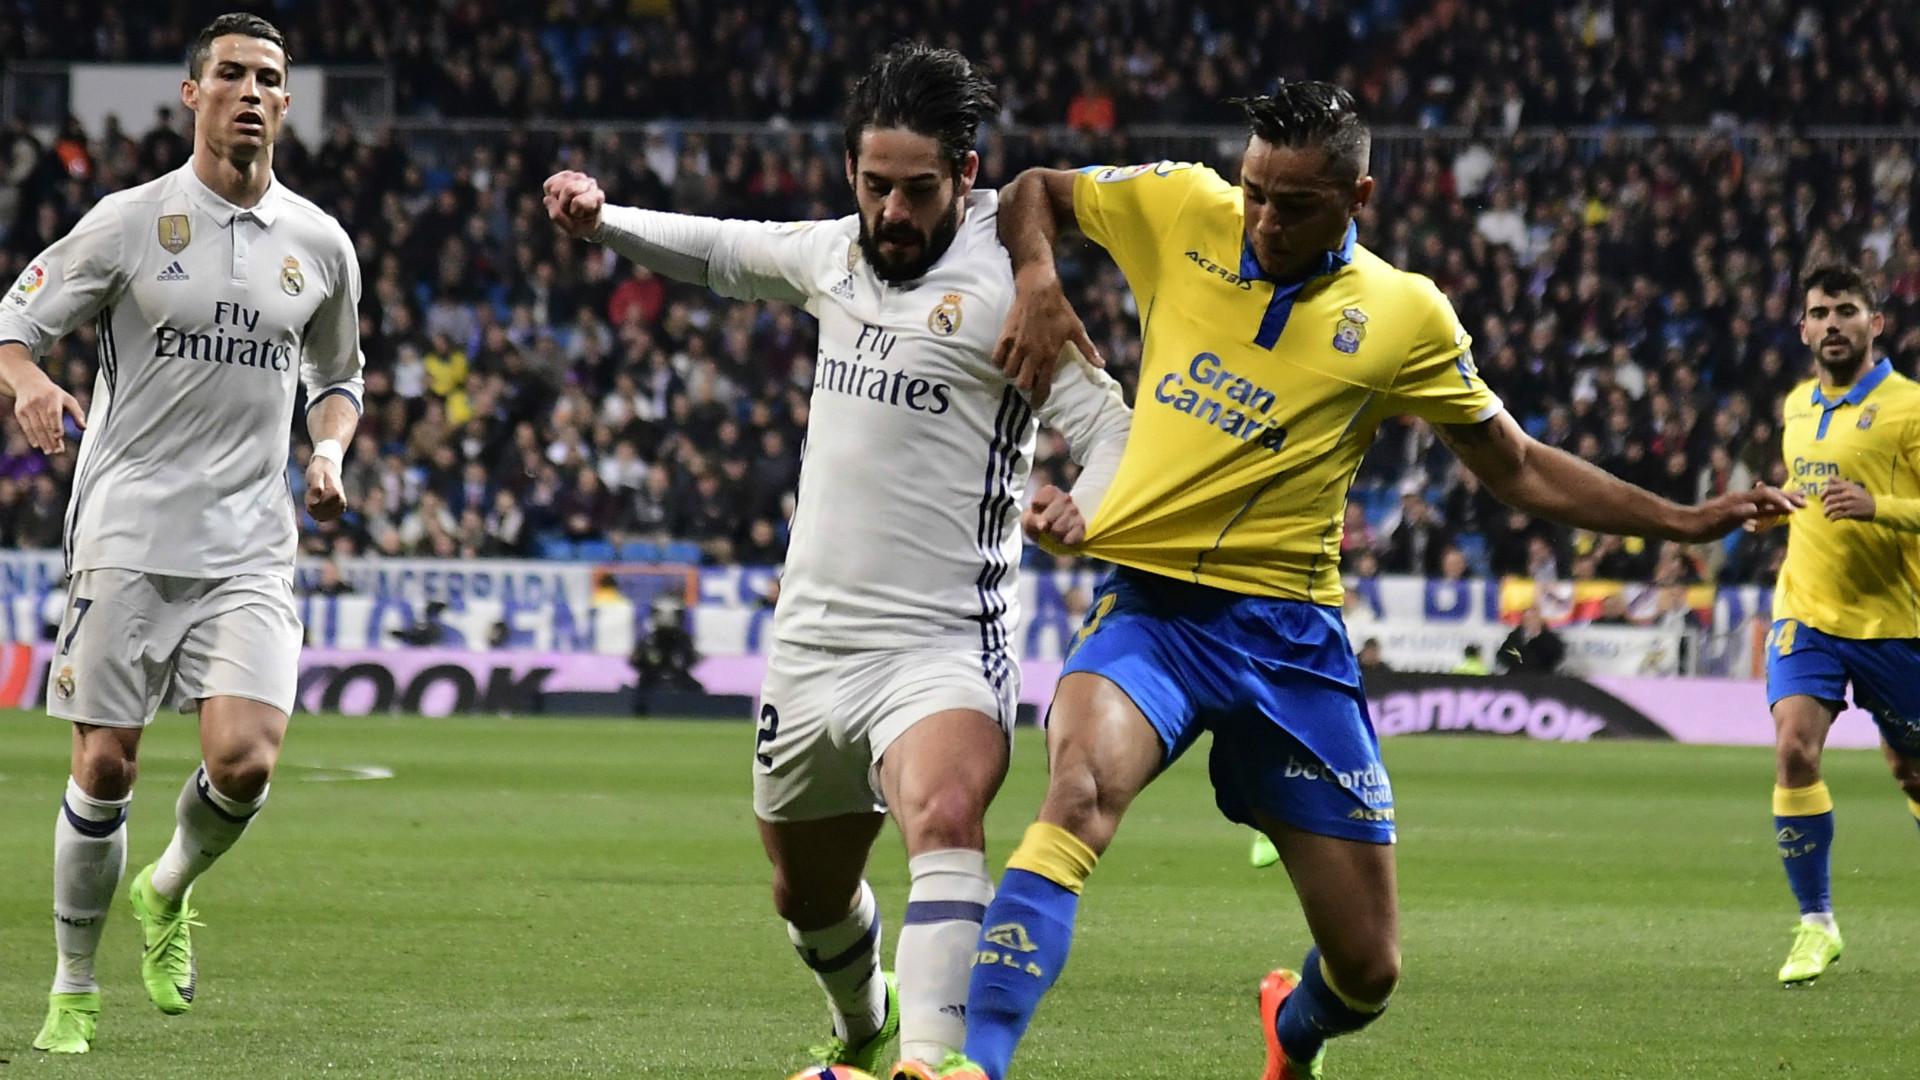 Las Palmas – Real Madrid